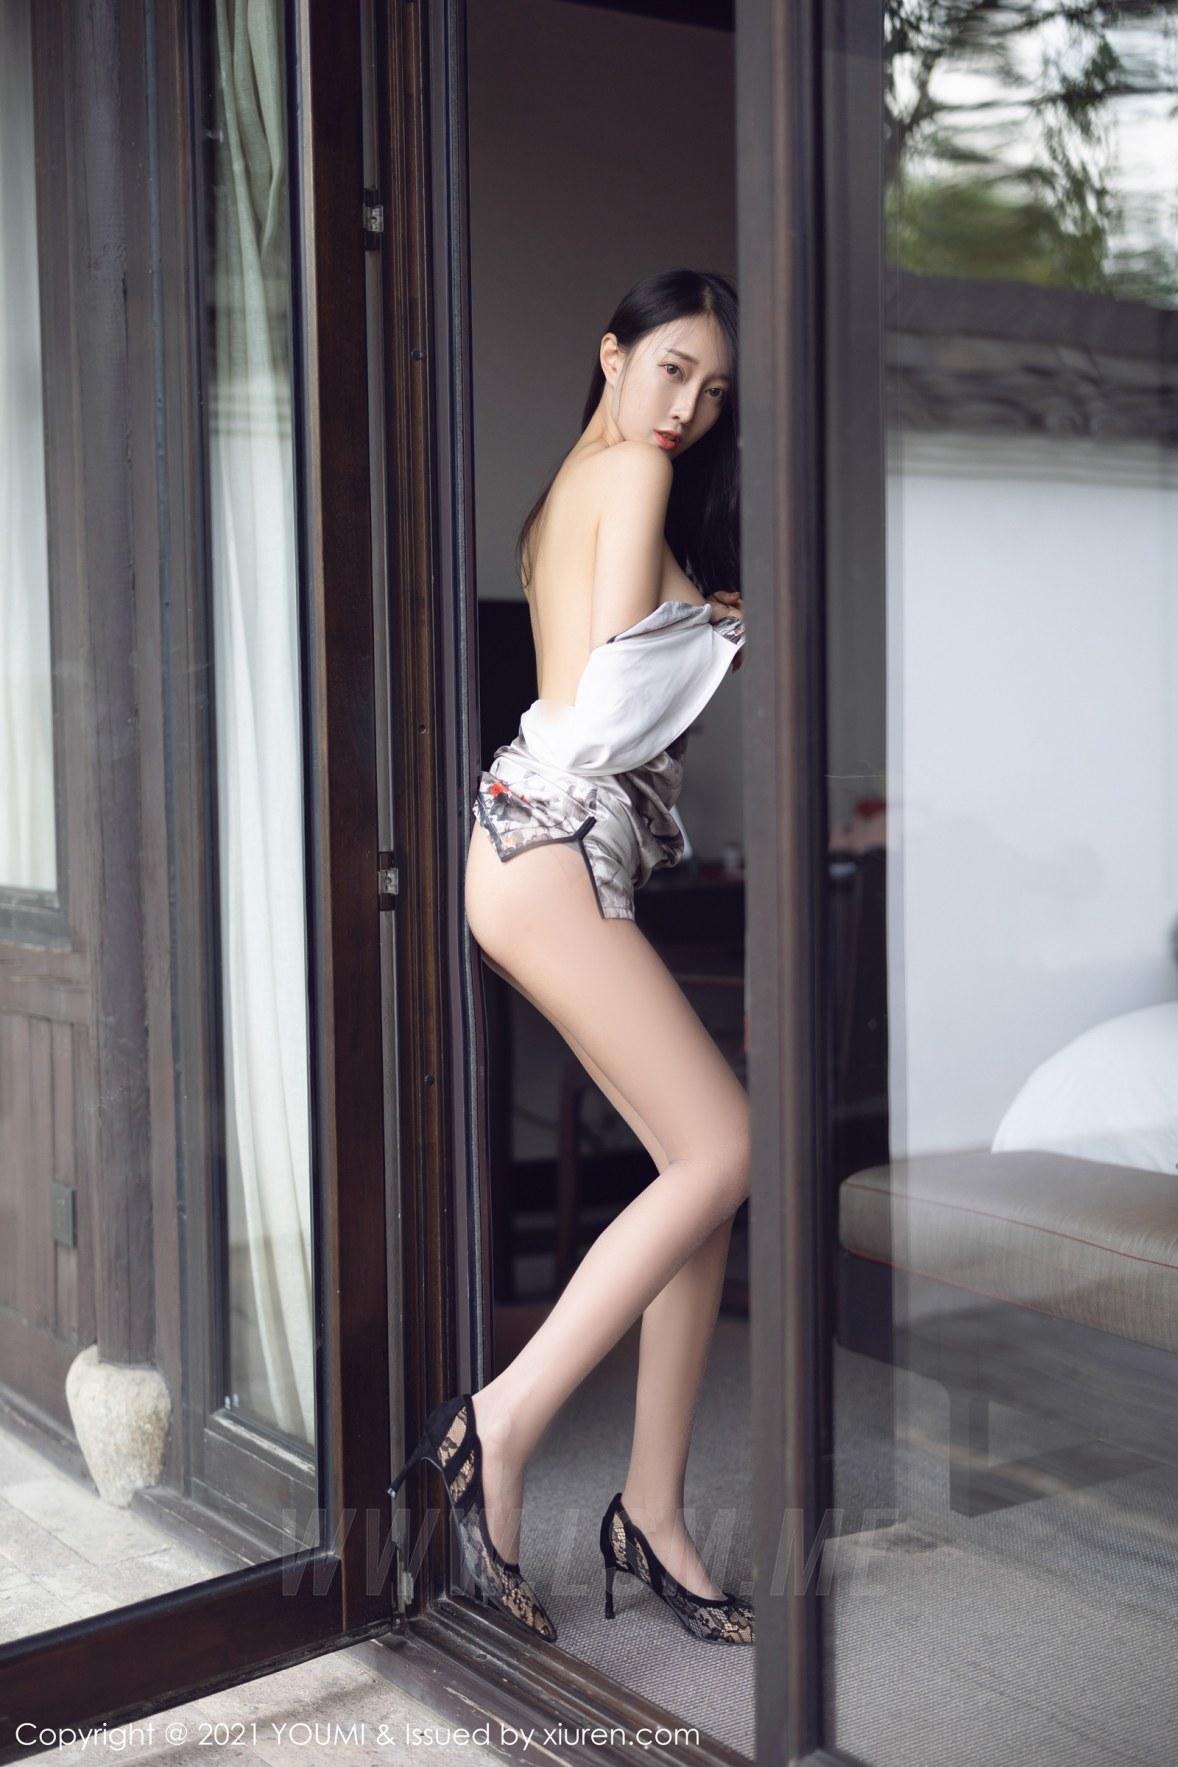 635 047 rc9 3600 5400 - YOUMI 尤蜜荟 Vol.635  浪漫旗袍 玥儿玥er - 尤蜜荟 -【免费在线写真】【丽人丝语】